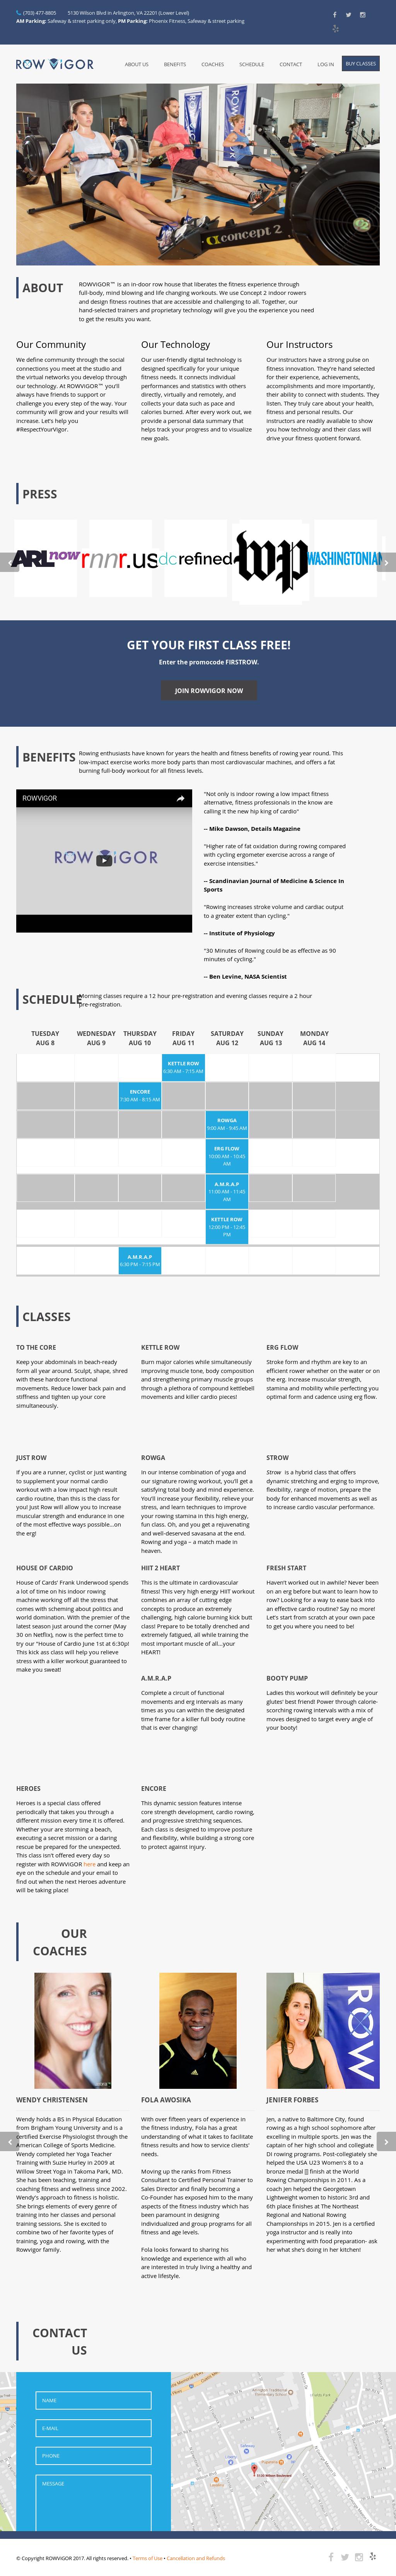 ROW ViGOR Competitors, Revenue and Employees - Owler Company Profile